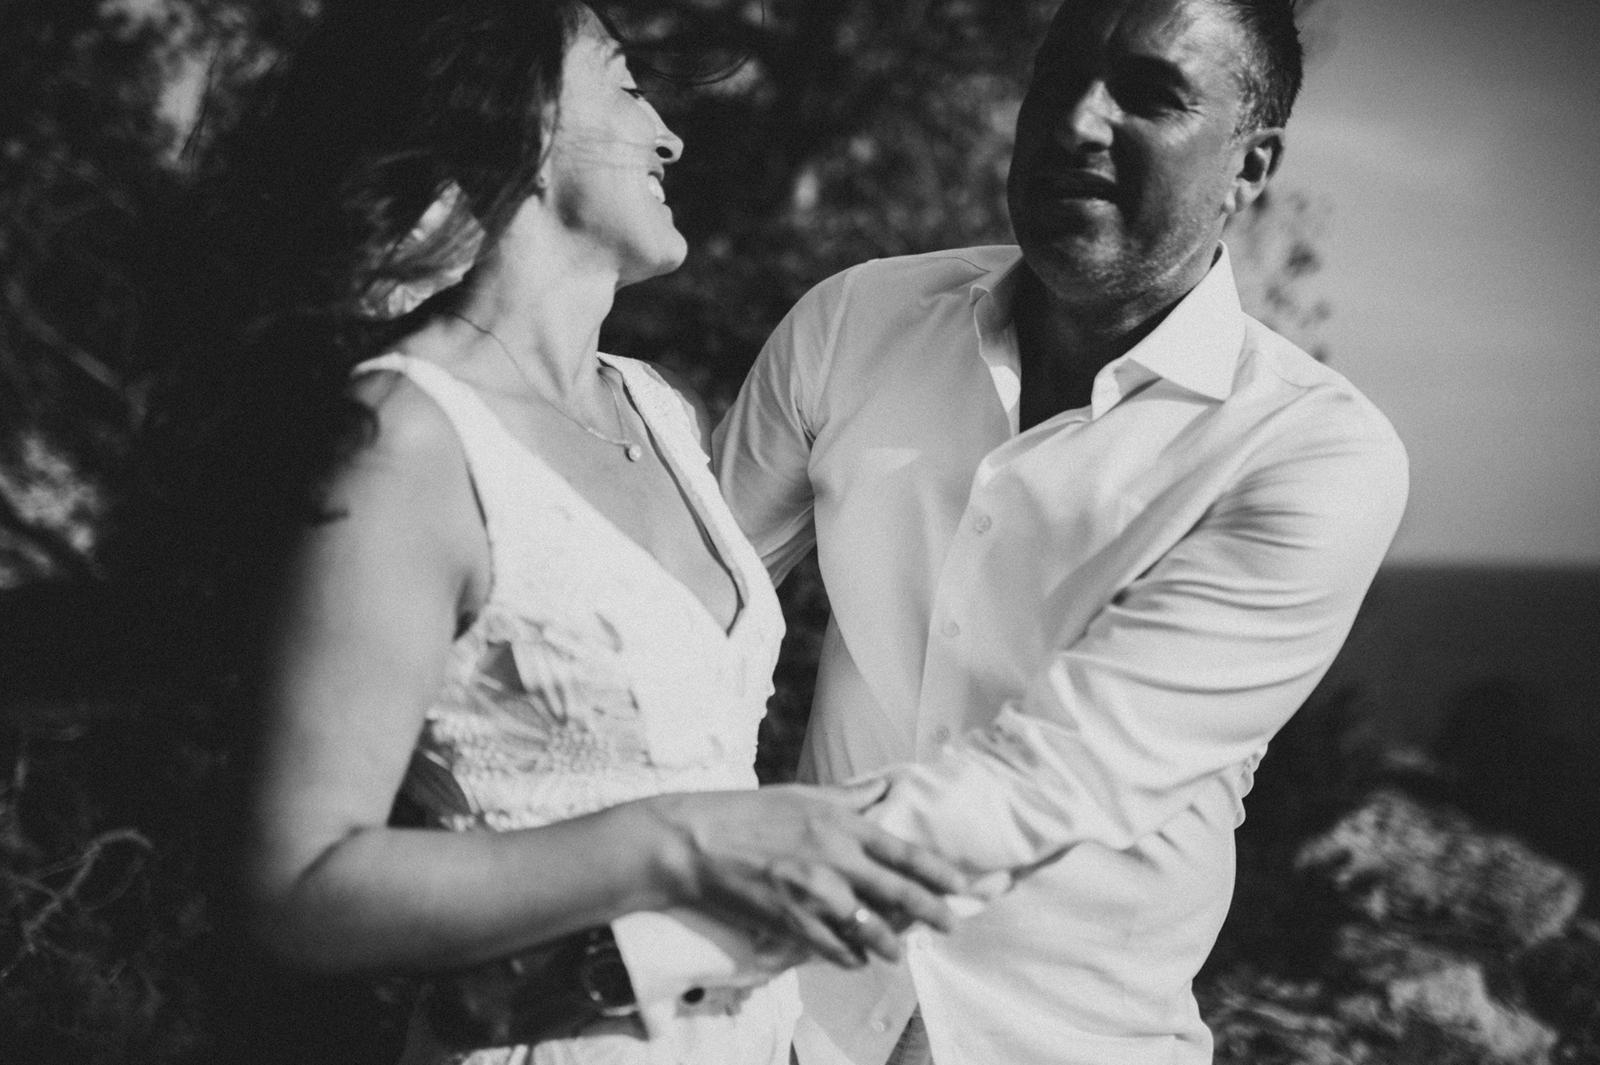 Hochzeitsfotograf_Ibiza_108.jpg